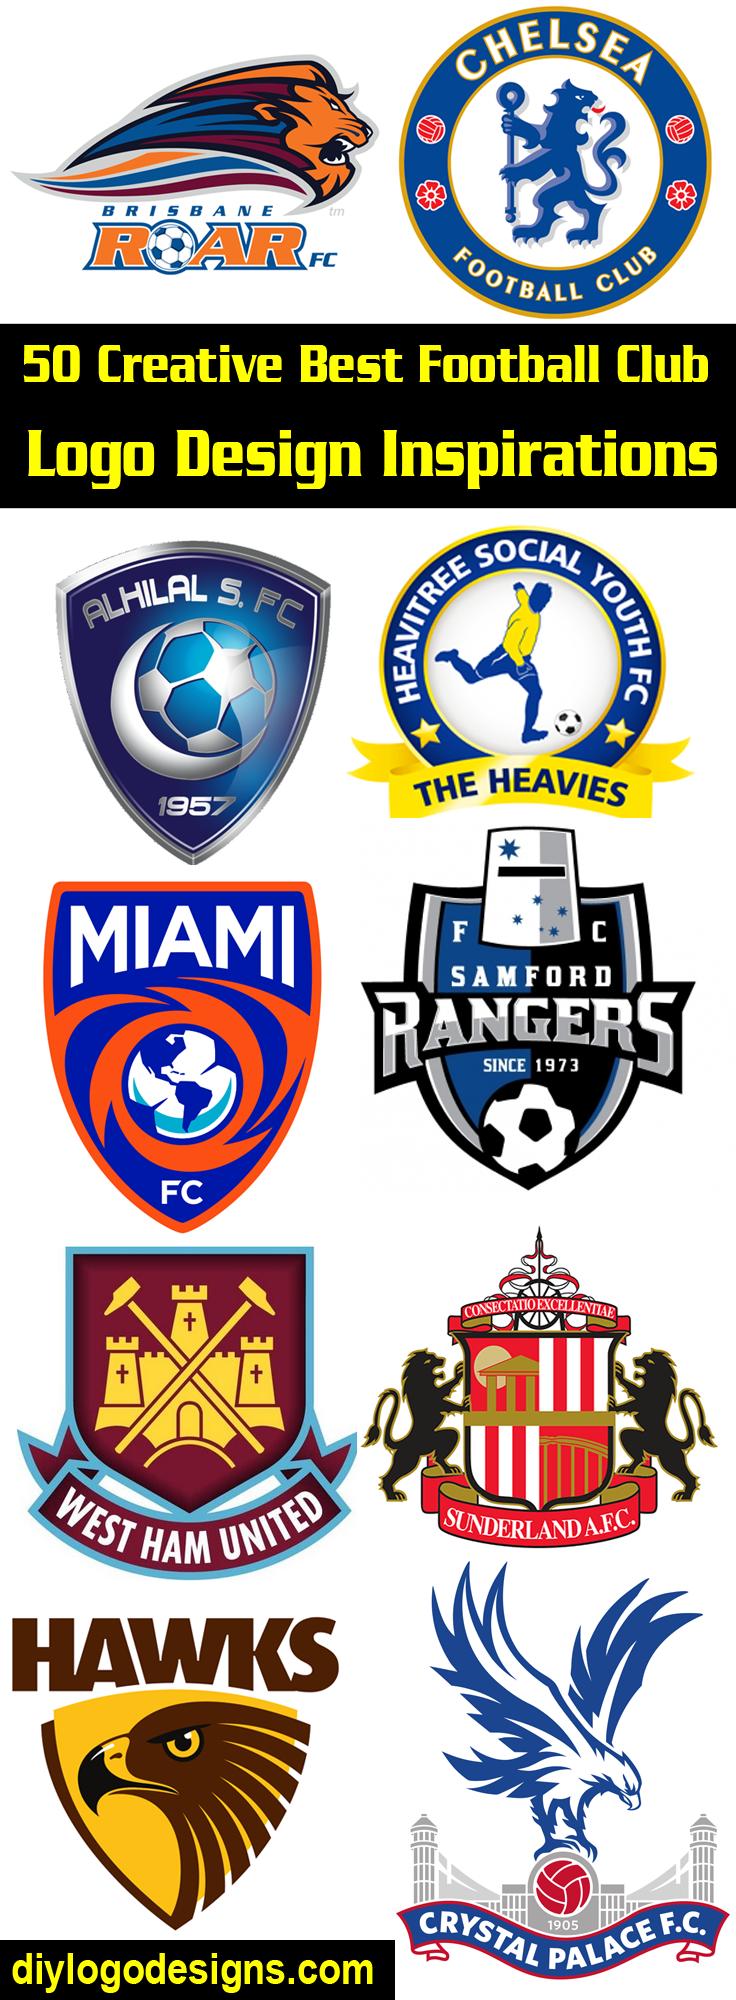 50 Creative Best Football Club Logo Design Inspirations See Full Collection Logo Design Inspiration Logo Design Diy Logo Design Creative